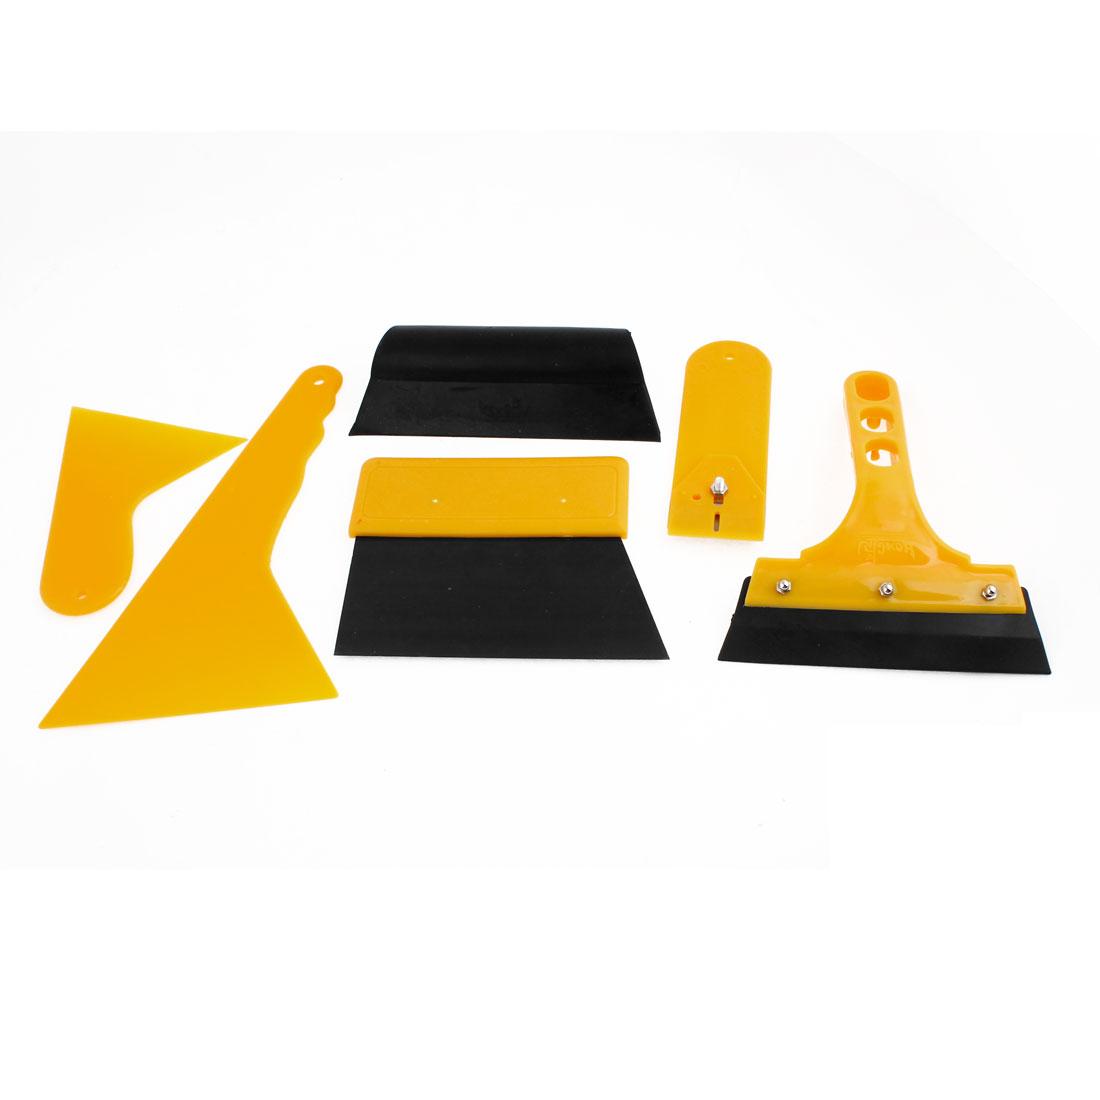 6 in 1 Blade Cutter Glass Wiper Film Scraper Installation Tool Yellow for Car